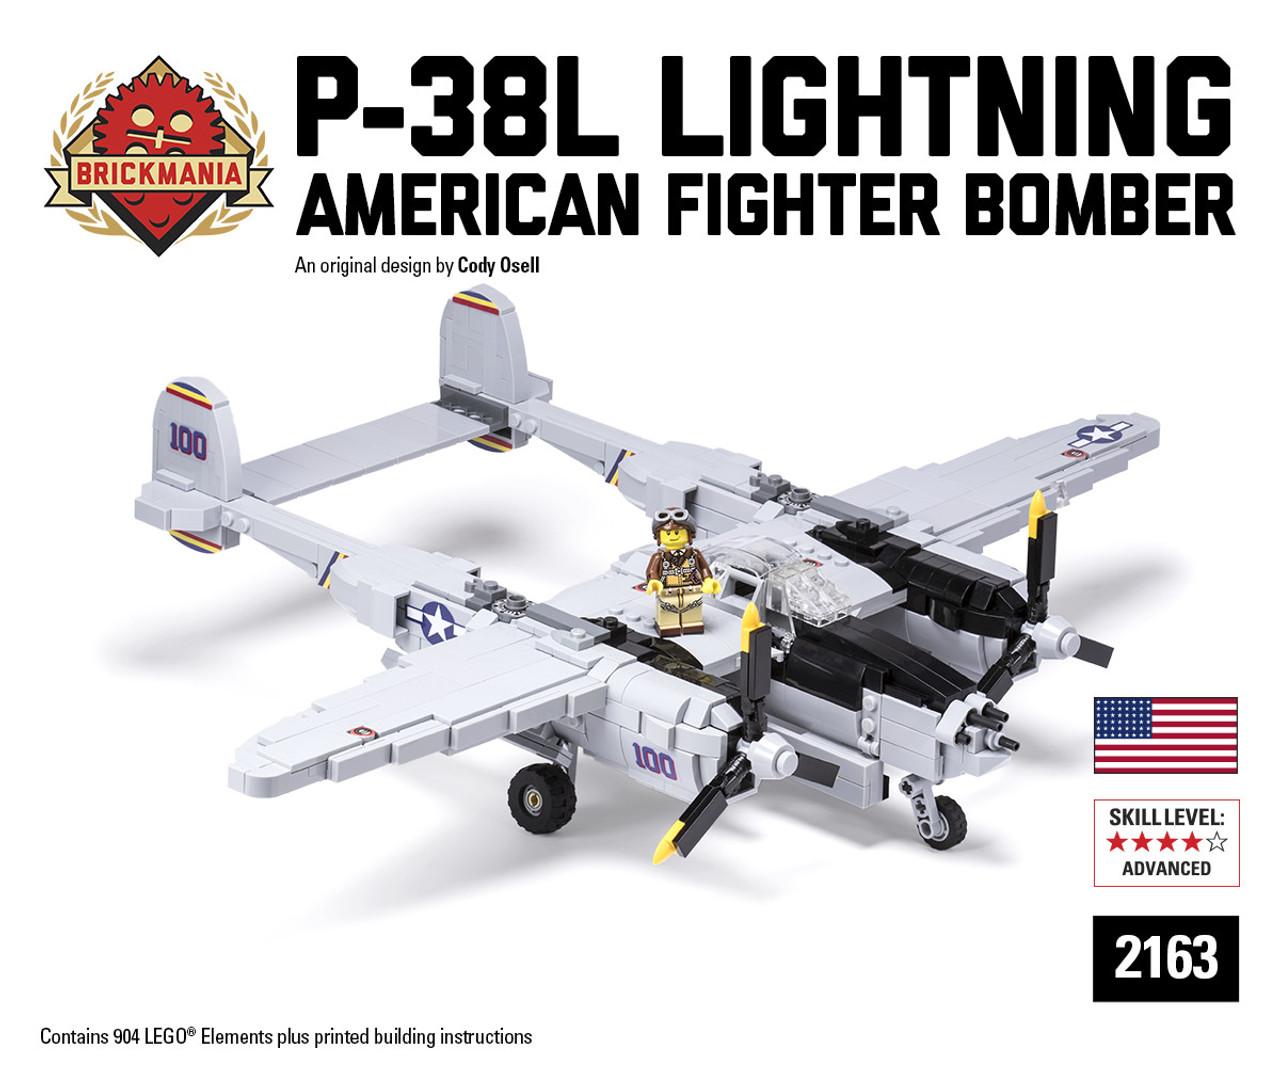 P-38L Lightning